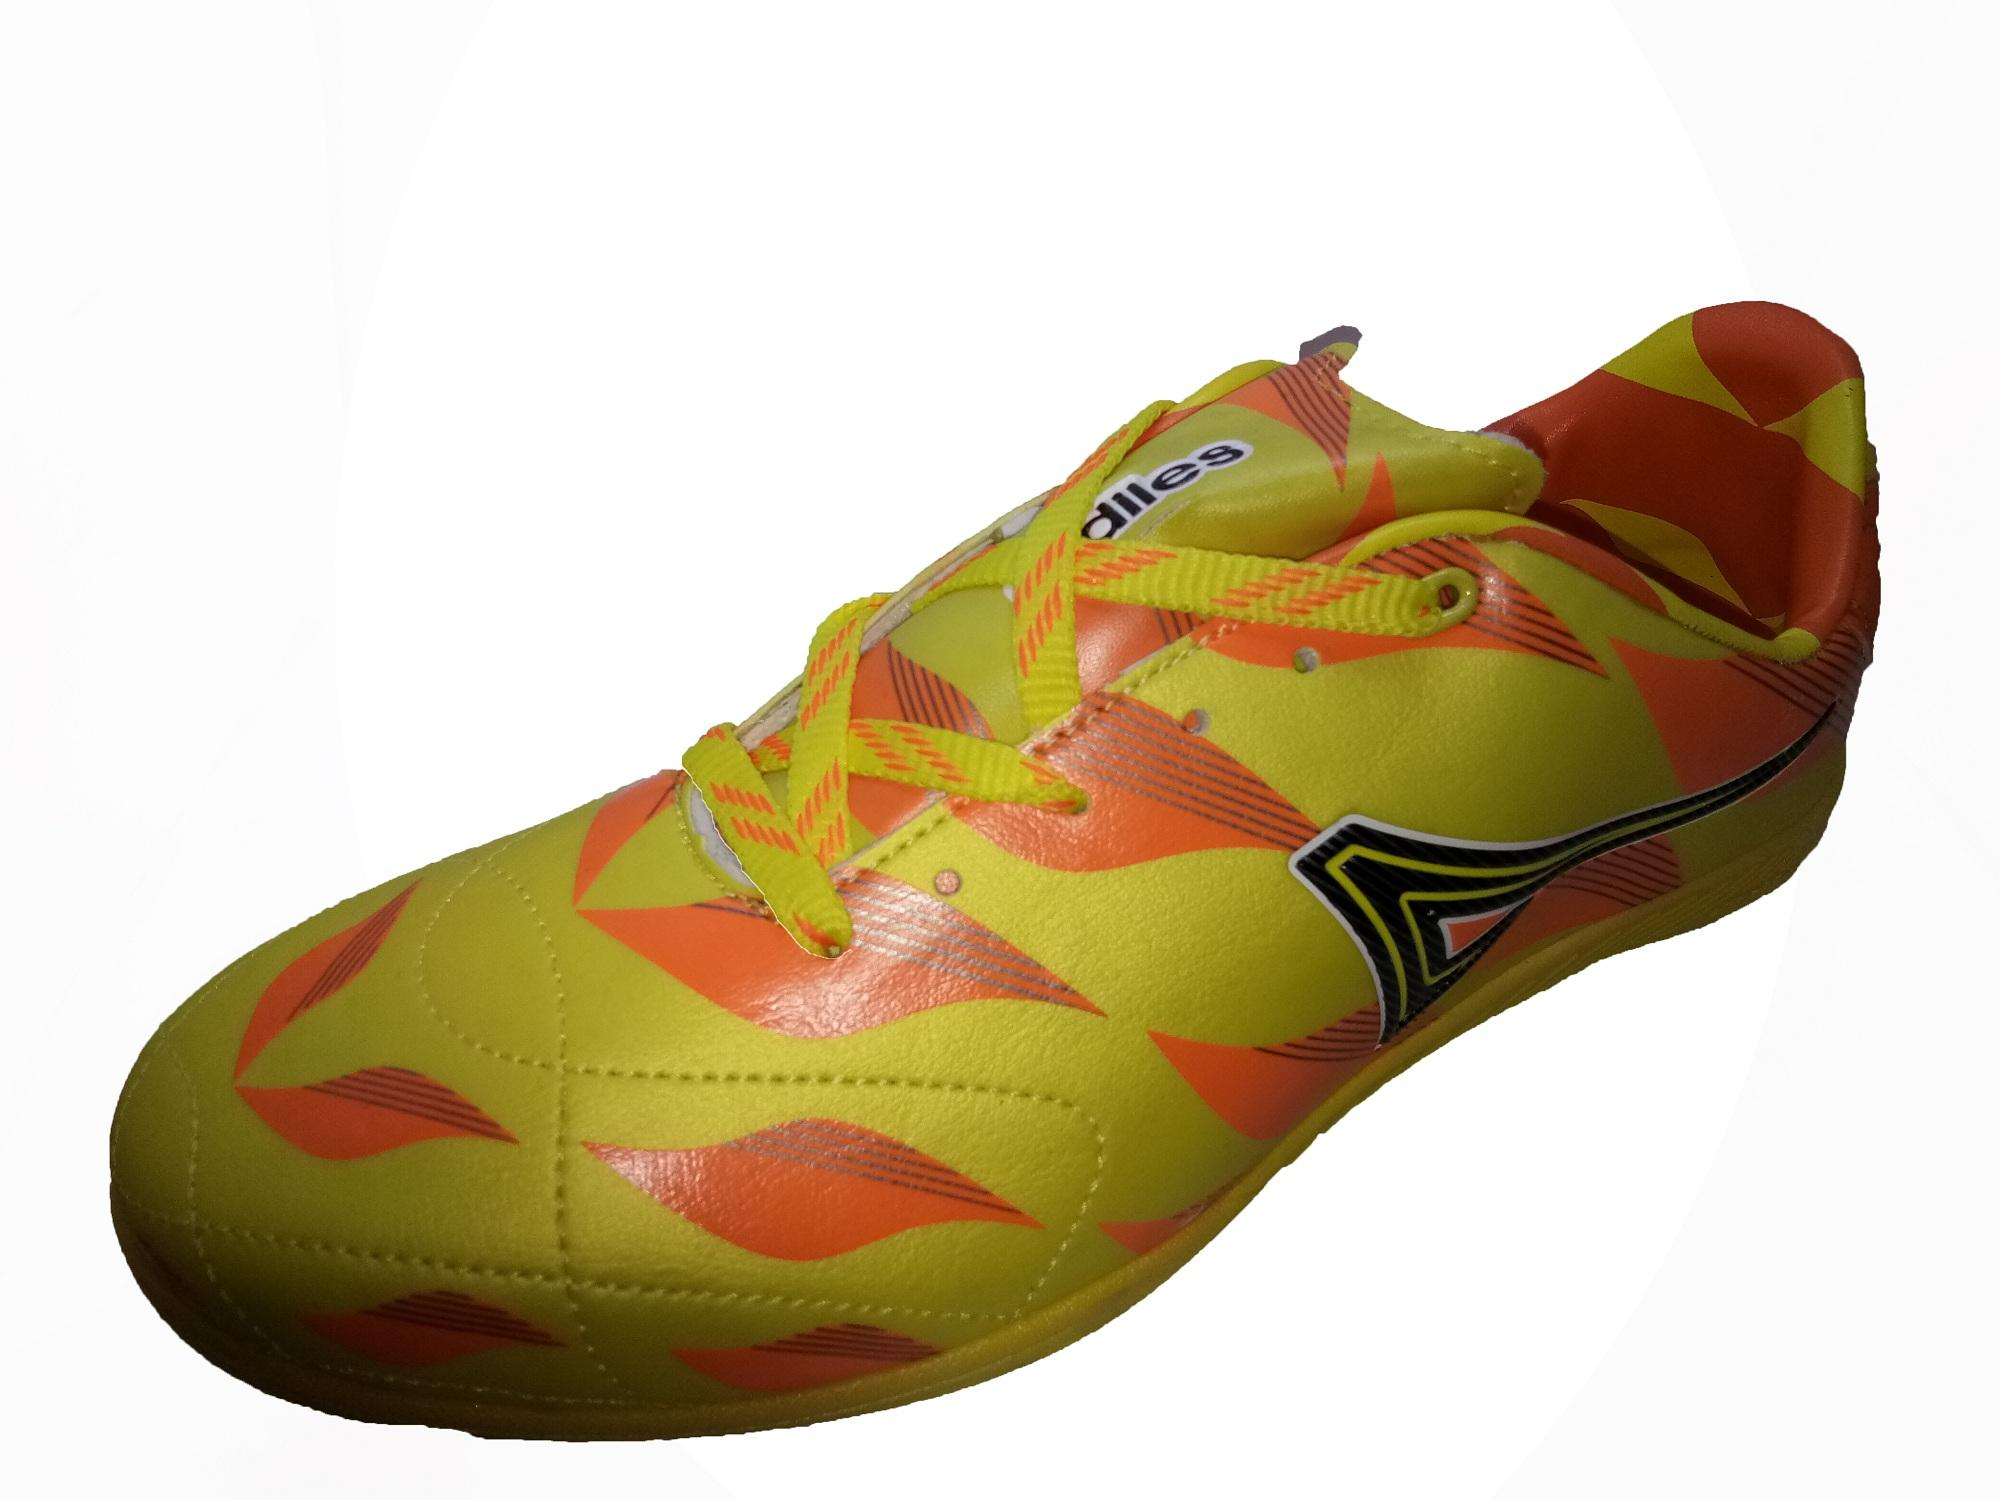 Jual Sepatu Futsal Ardiles Murah Garansi Dan Berkualitas Id Store 770 Men Soccer Shoes Kuning 42 Rp 80000